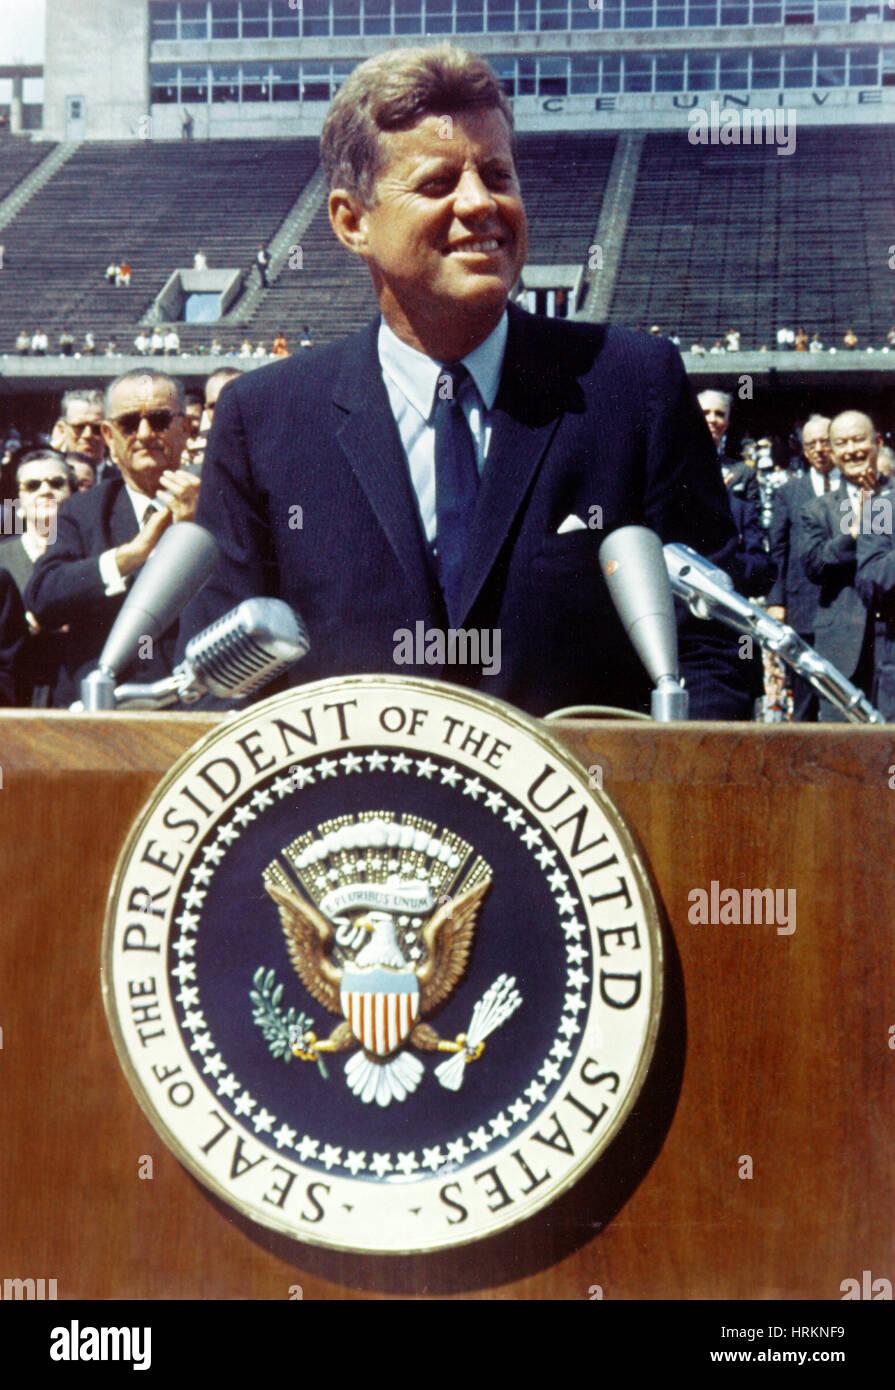 JFK at Rice University - Stock Image